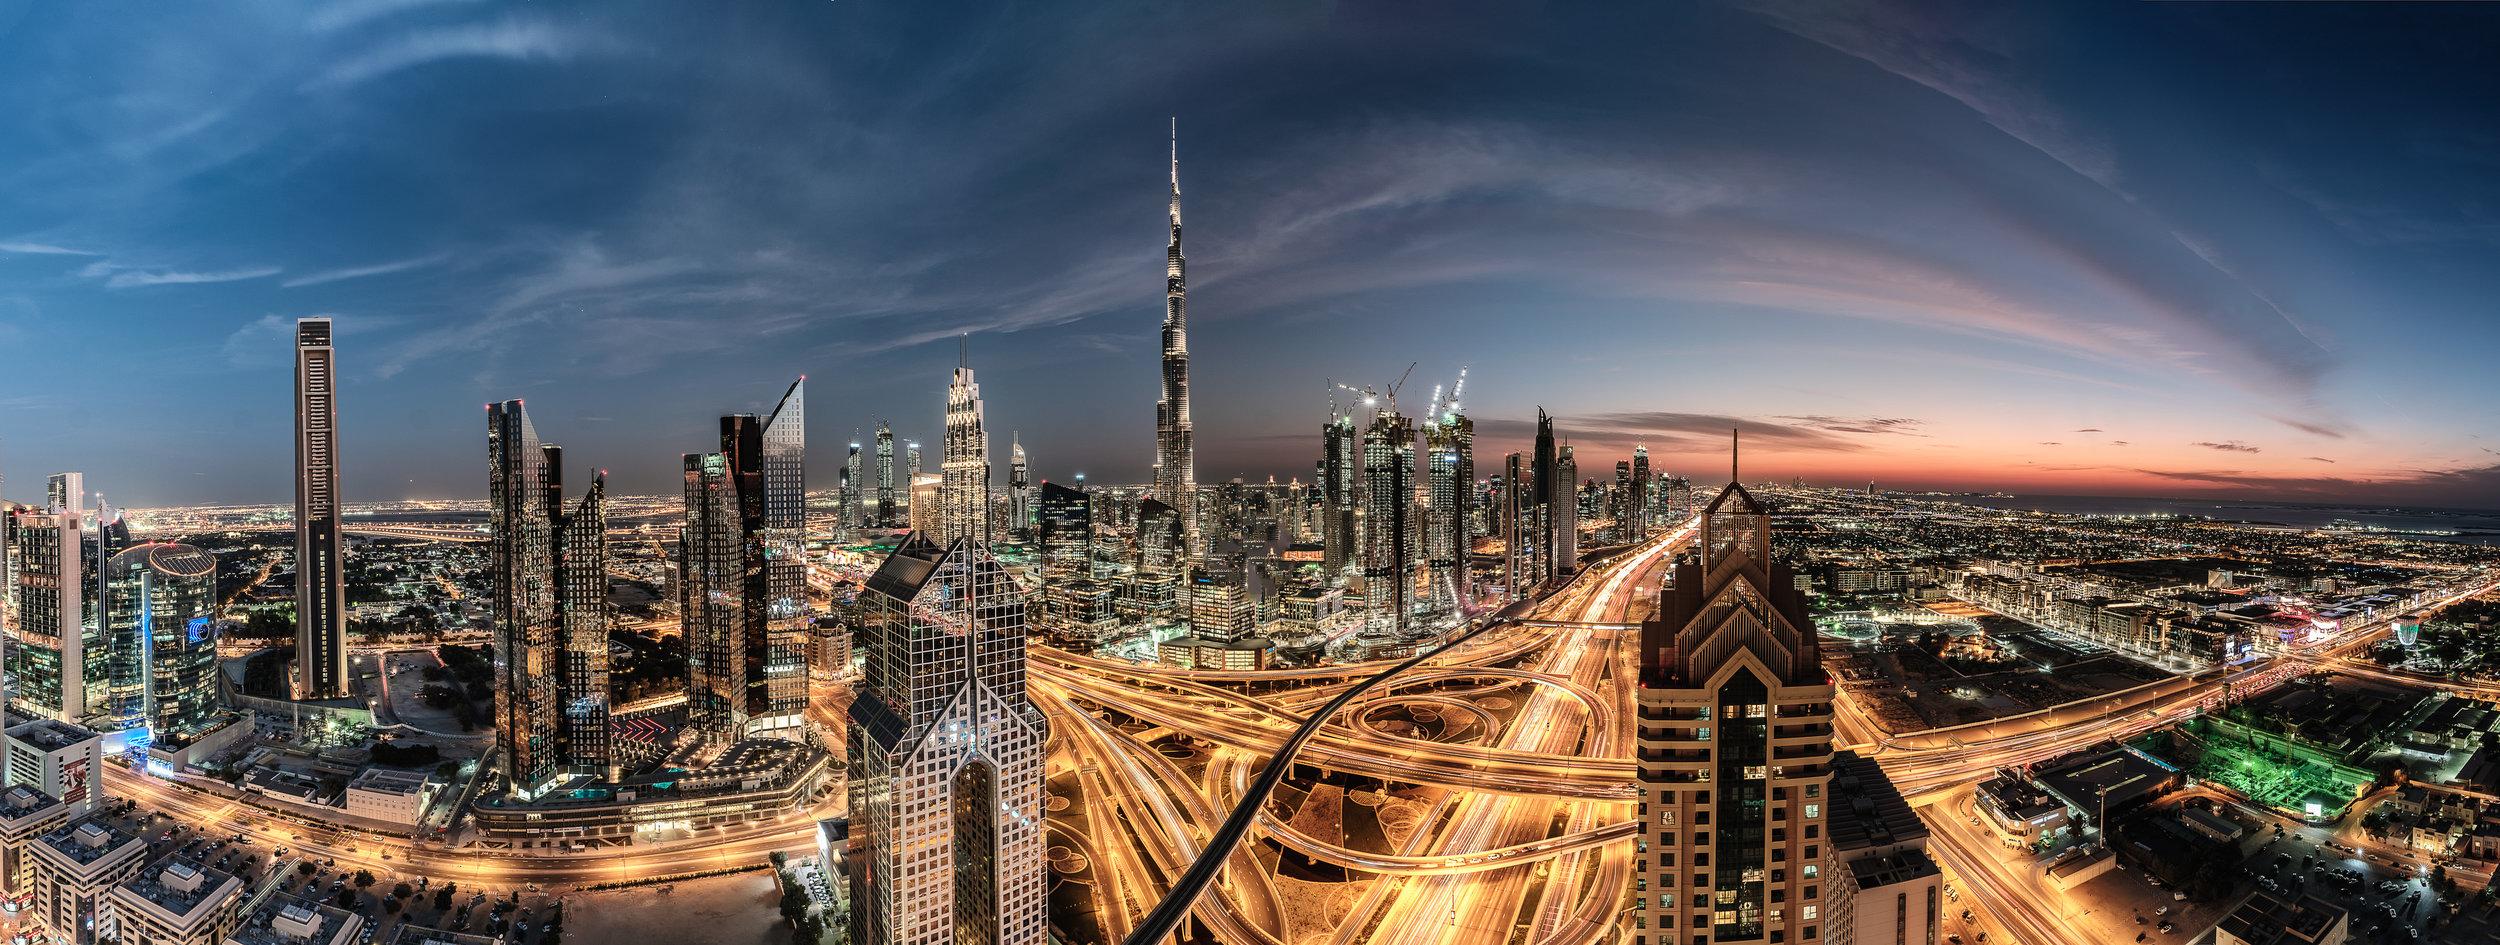 Dubai Cityview from the Shangrila Hotel